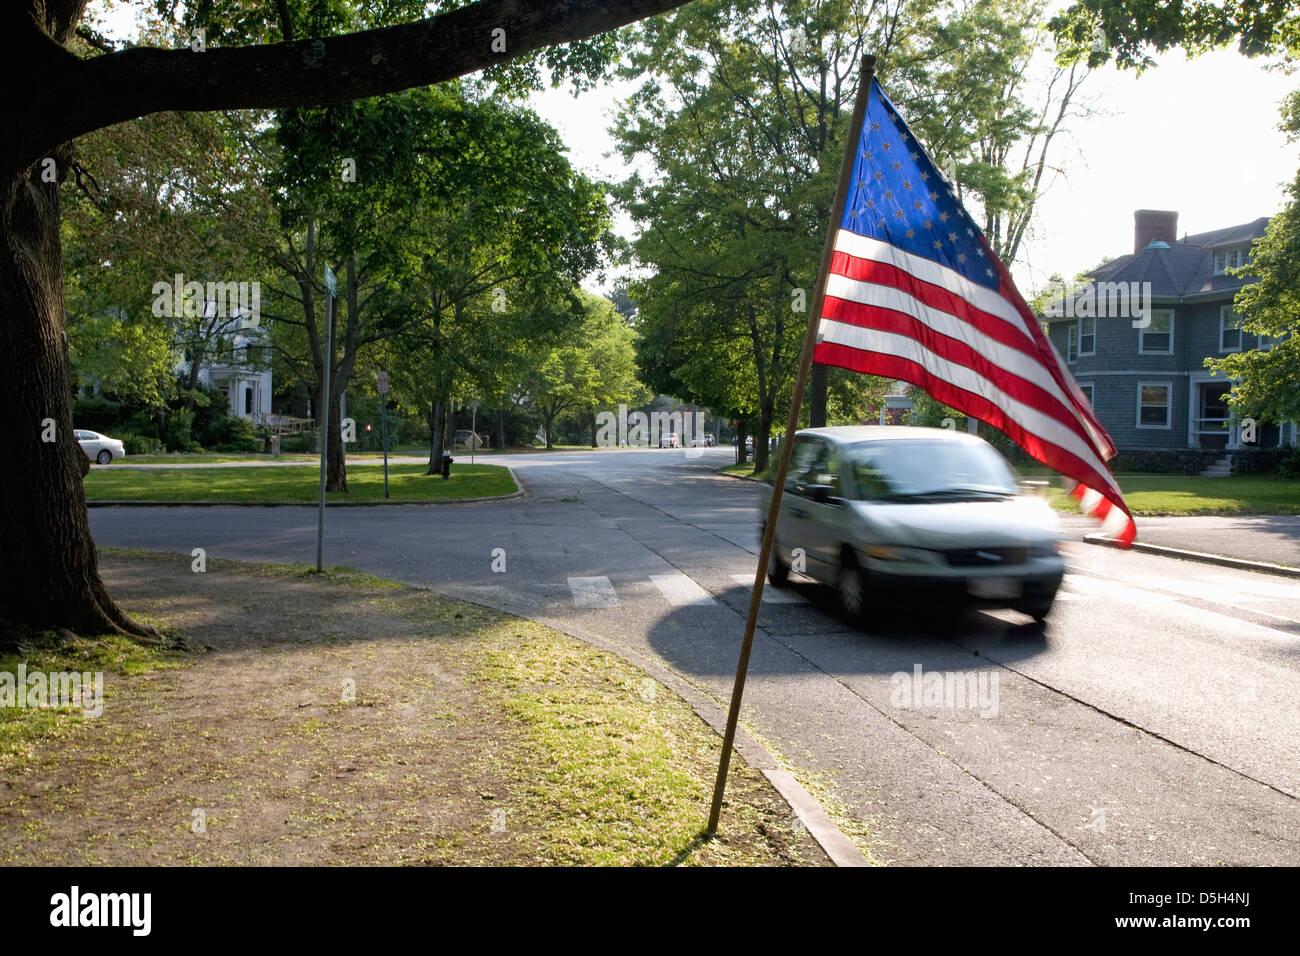 American Flag flies over speeding car in historic Lexington, MA on Memorial Day, 2011 - Stock Image